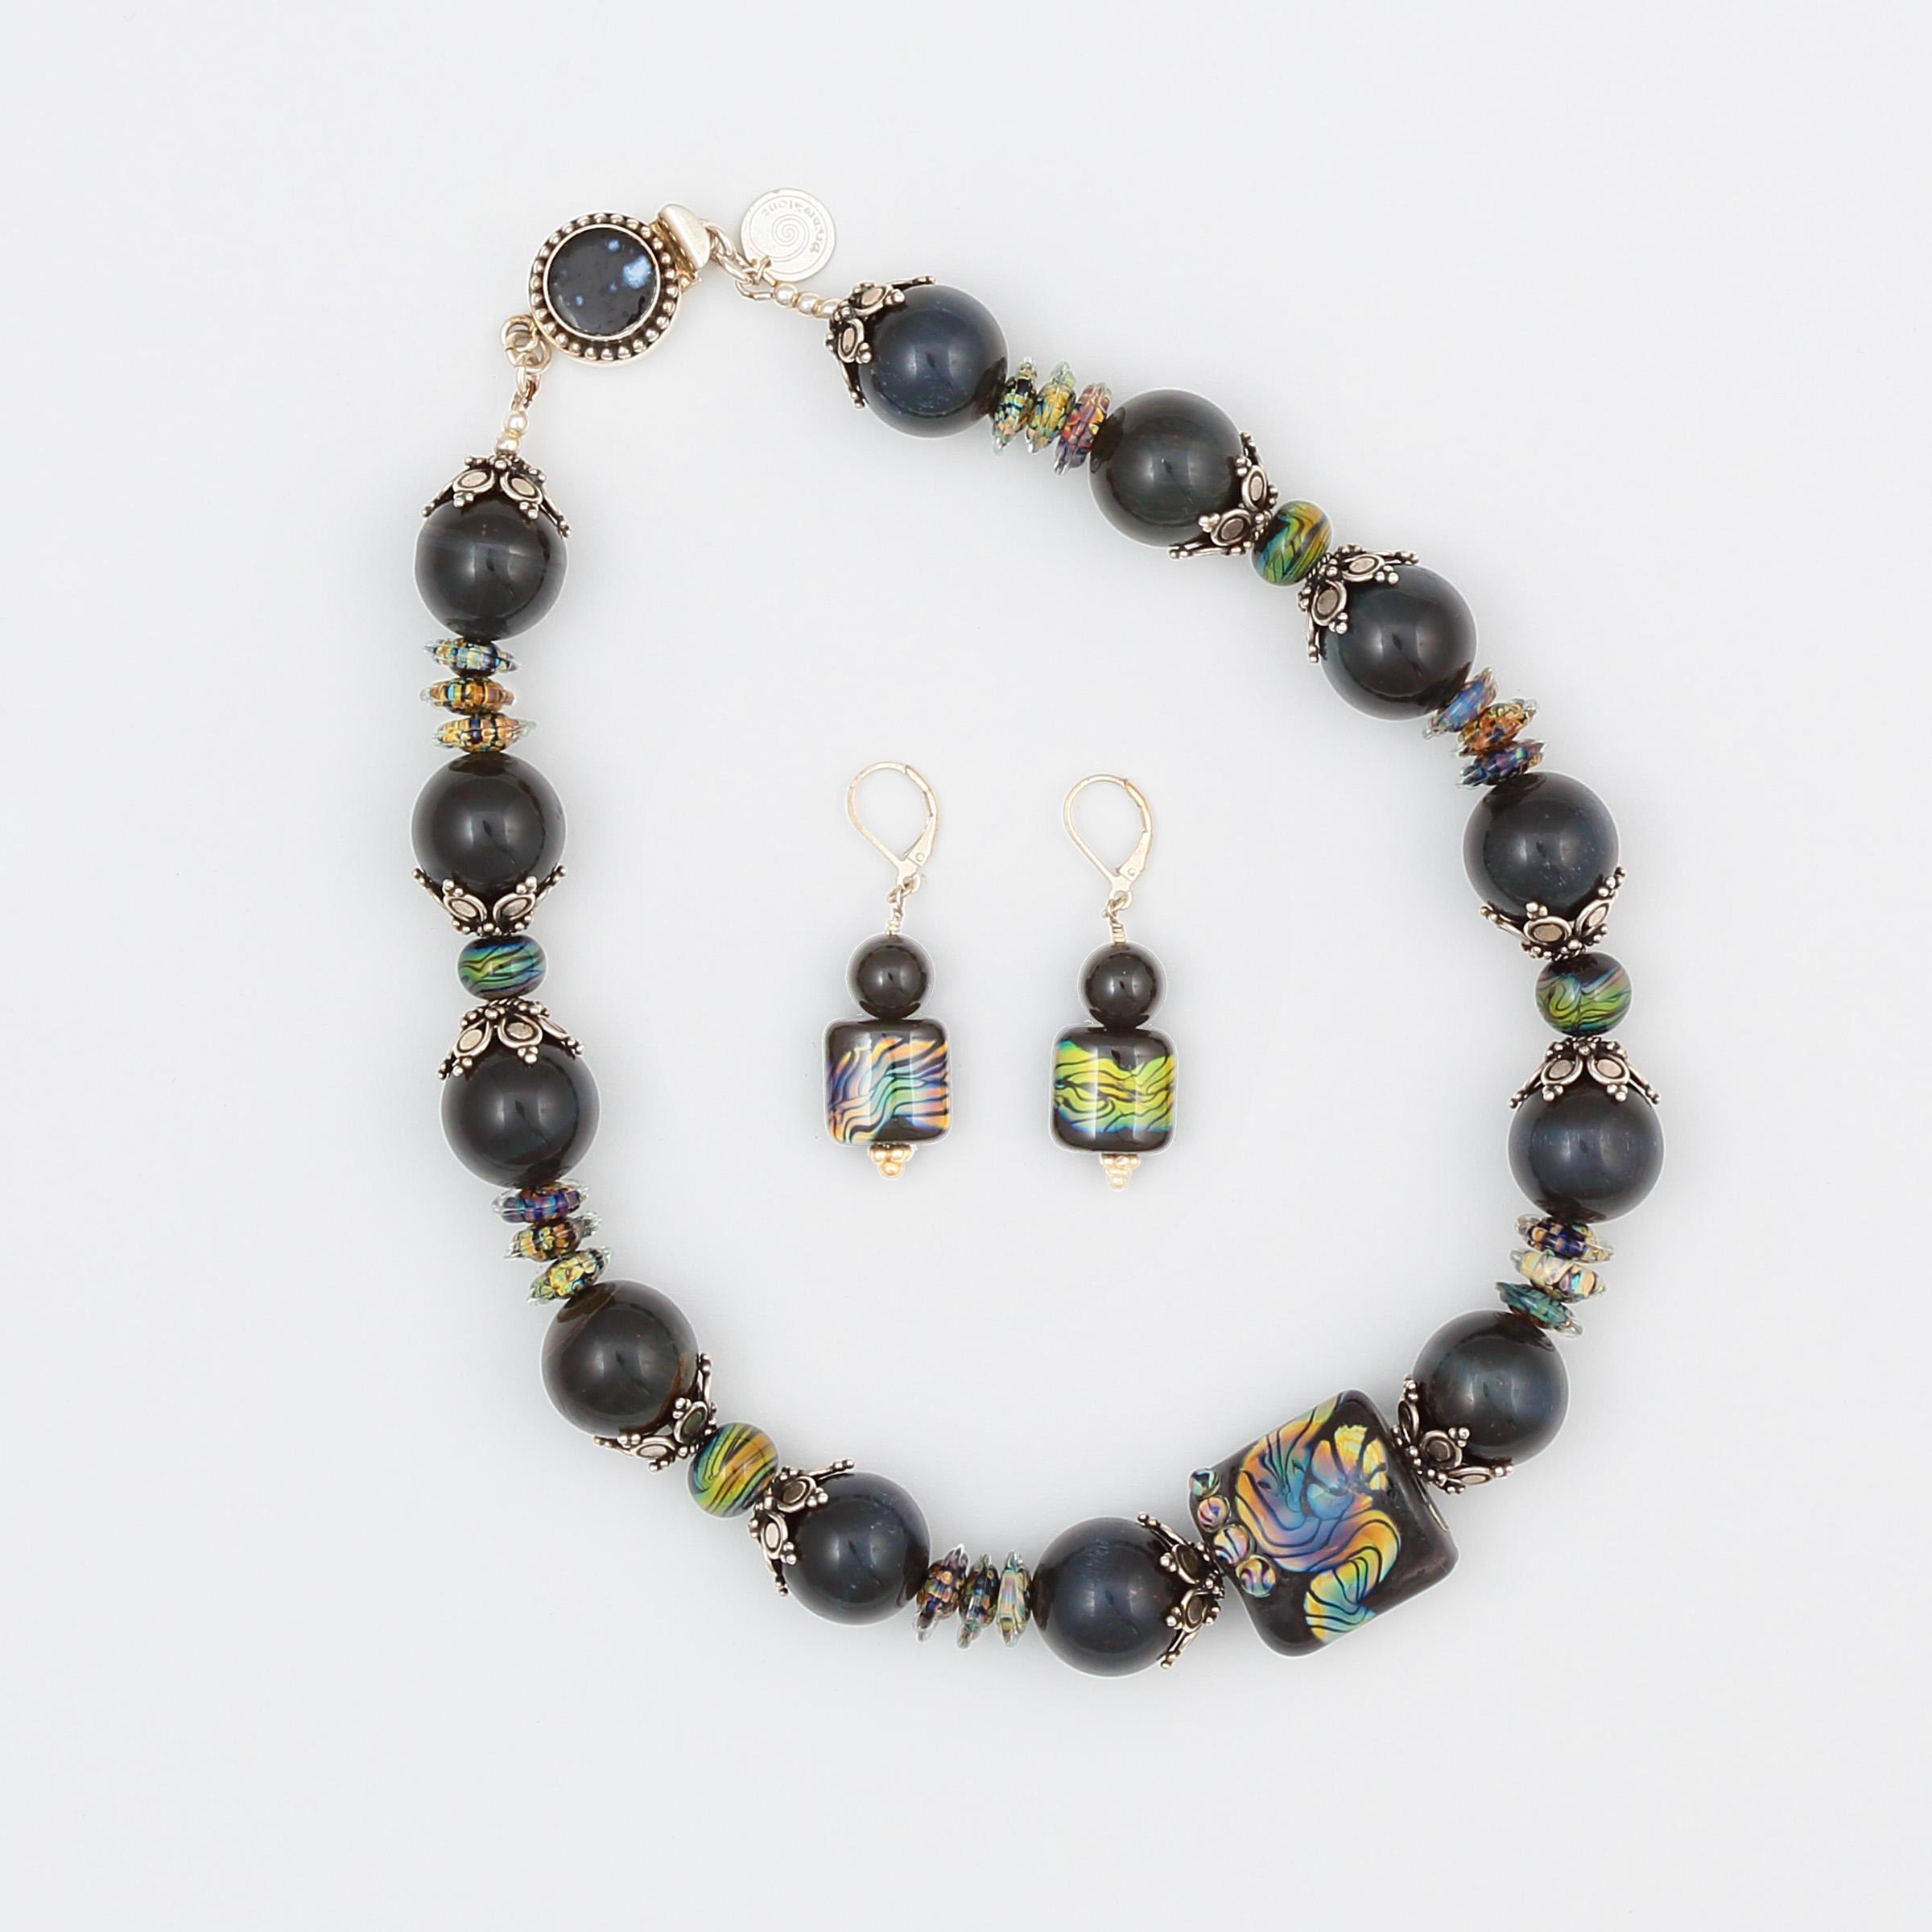 Midnight Comet Necklace